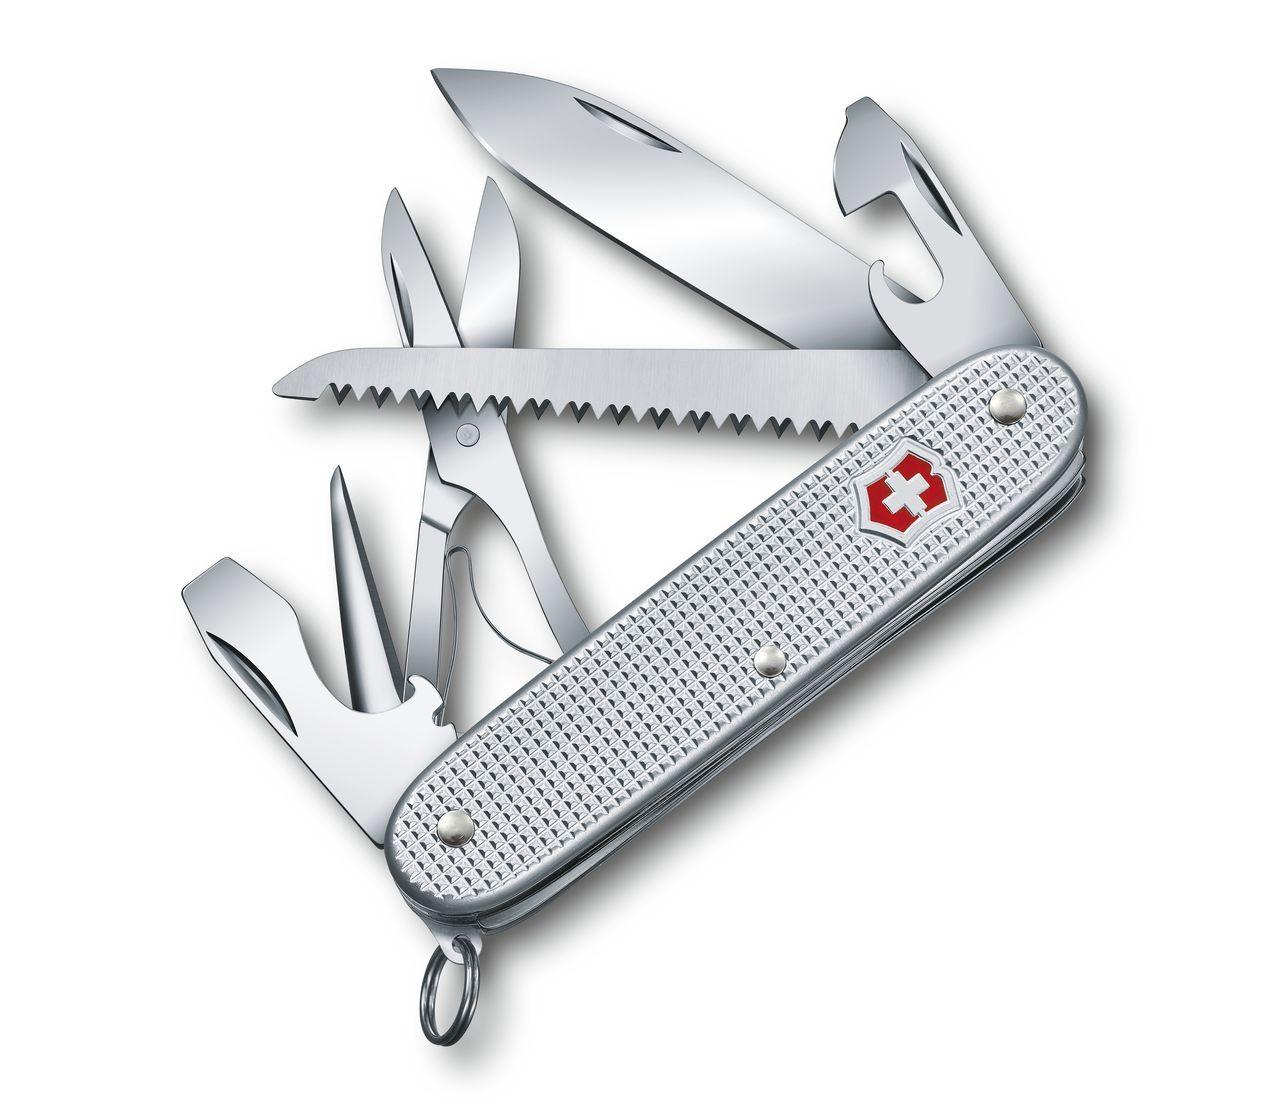 Canivete Victorinox Farmer X Alox 9 funções 9.3 cm 0.8271.26